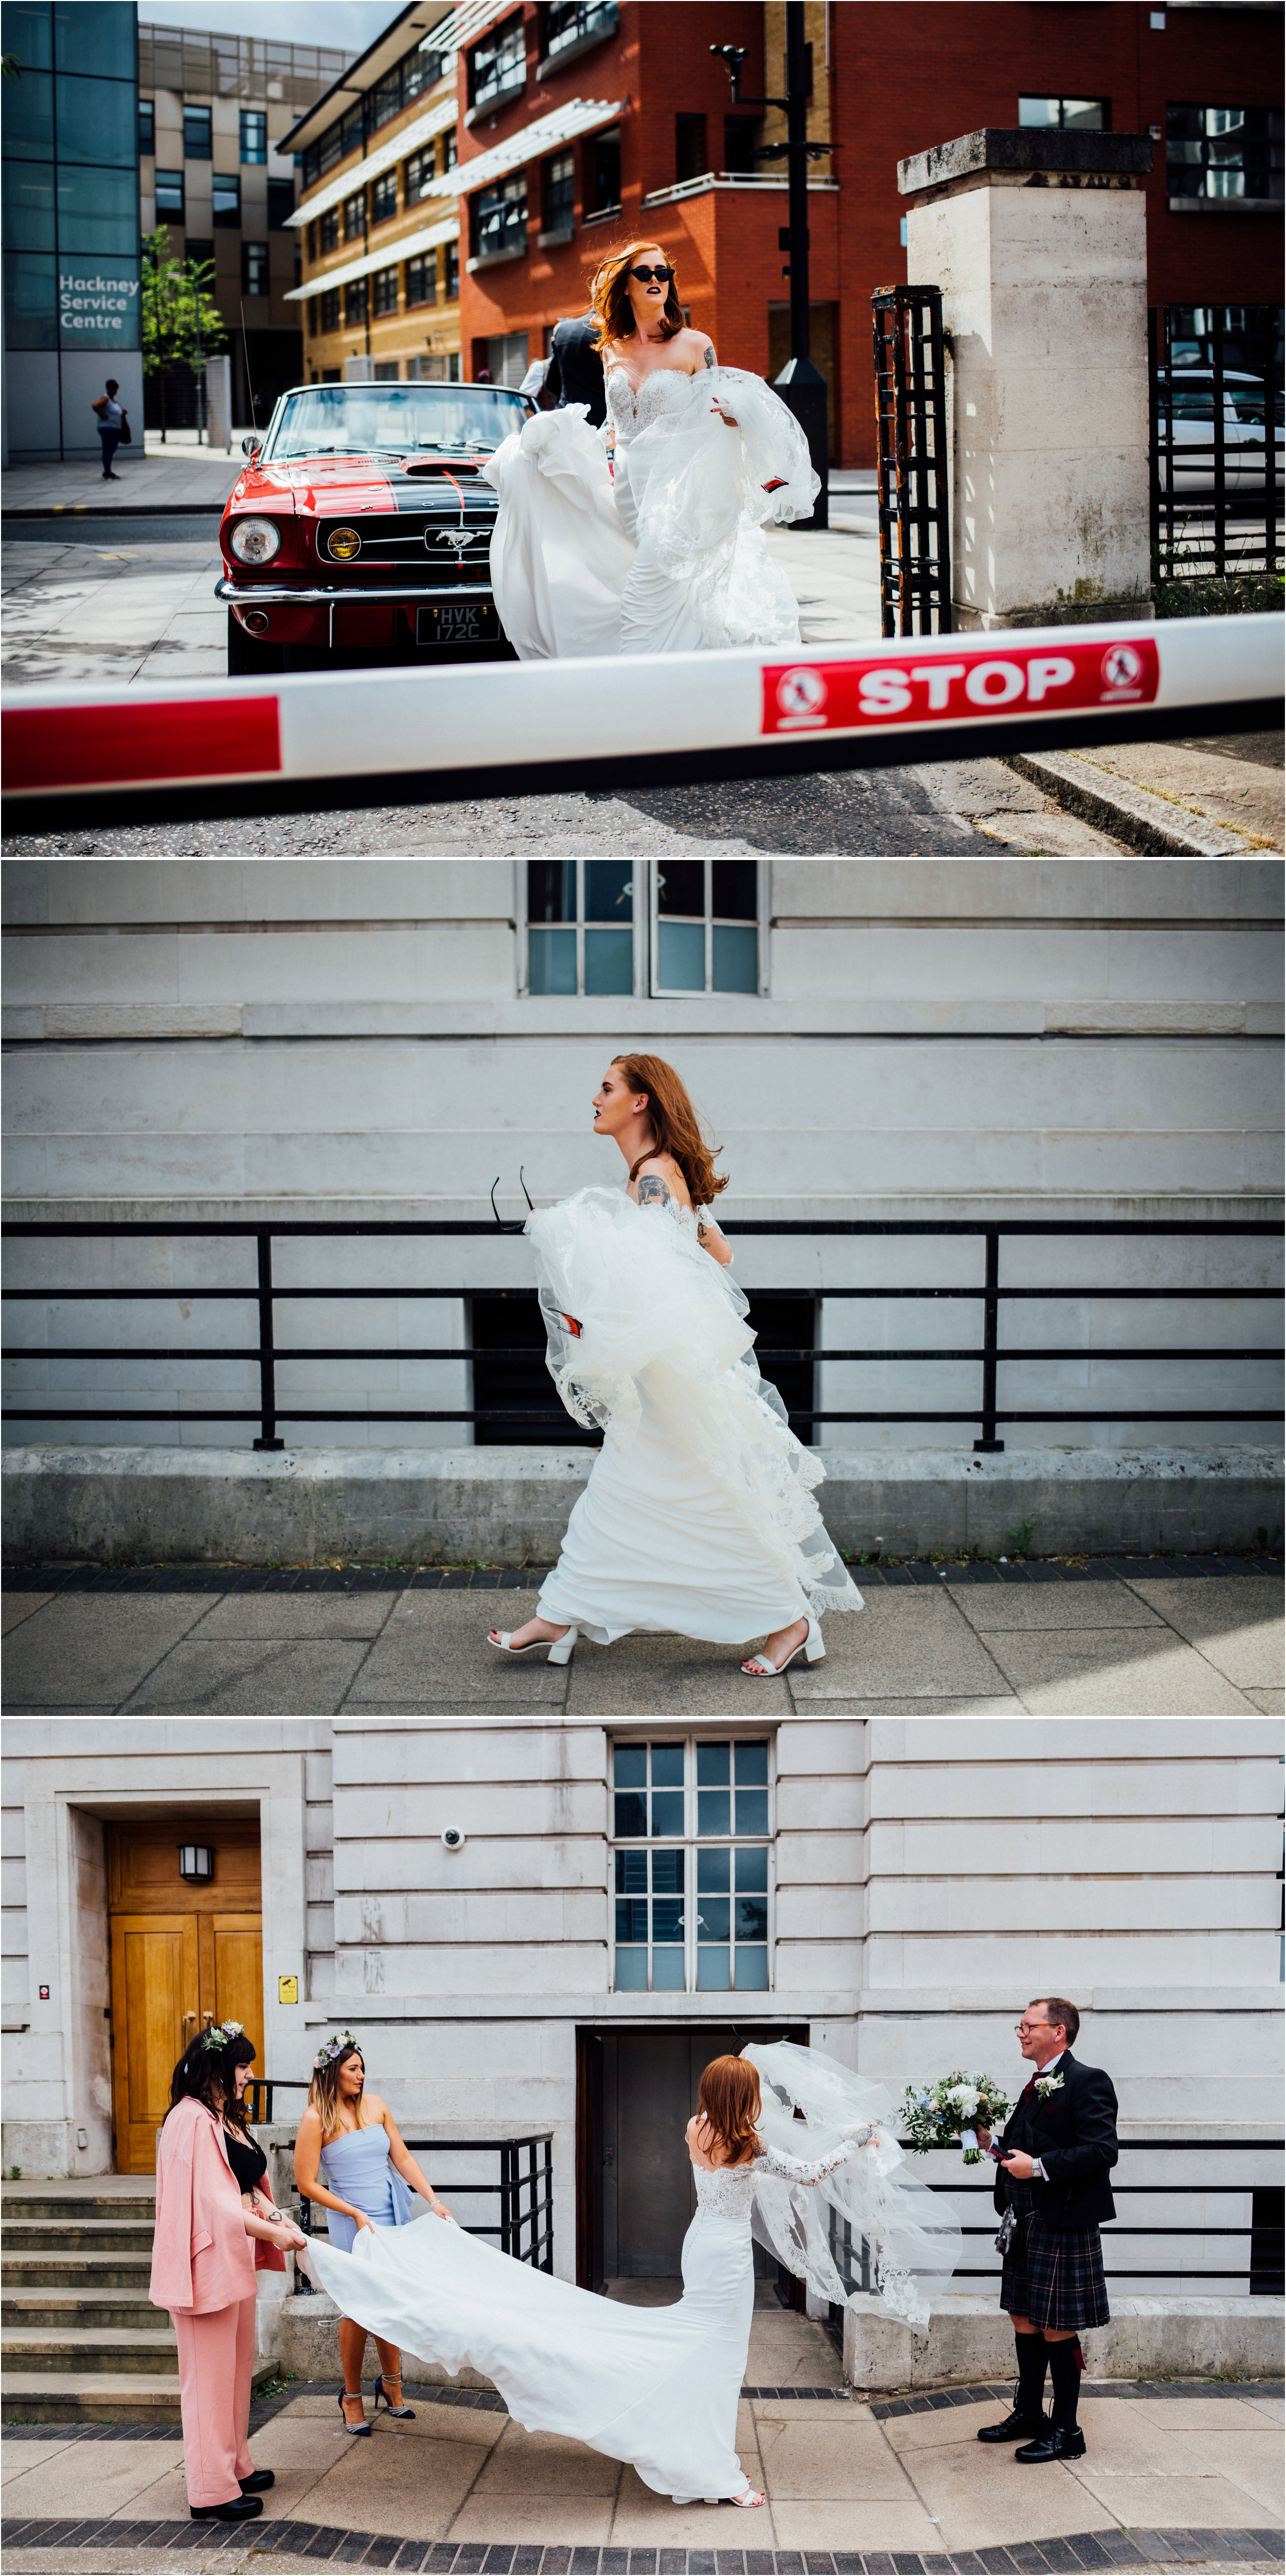 Hackney town hall wedding photography_0045.jpg